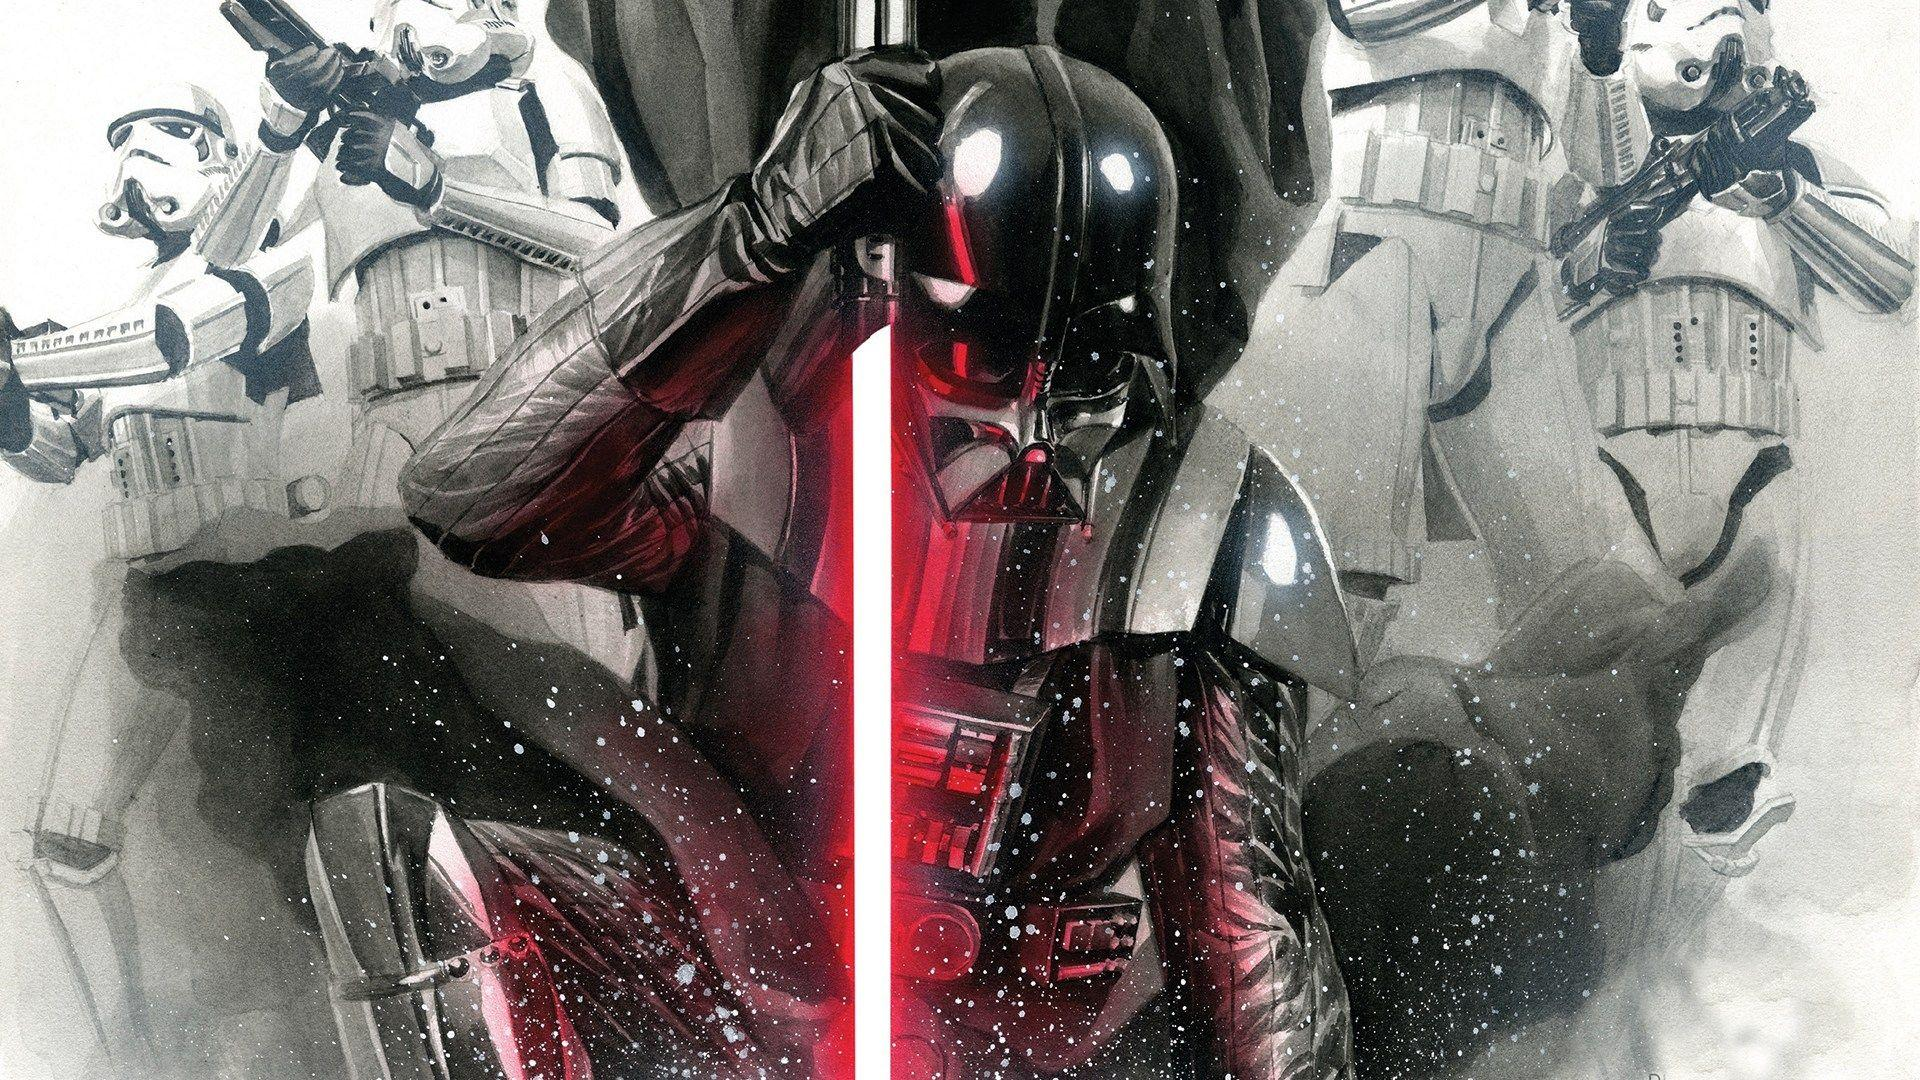 Darth Vader 1080p Wallpapers Wallpaper Cave